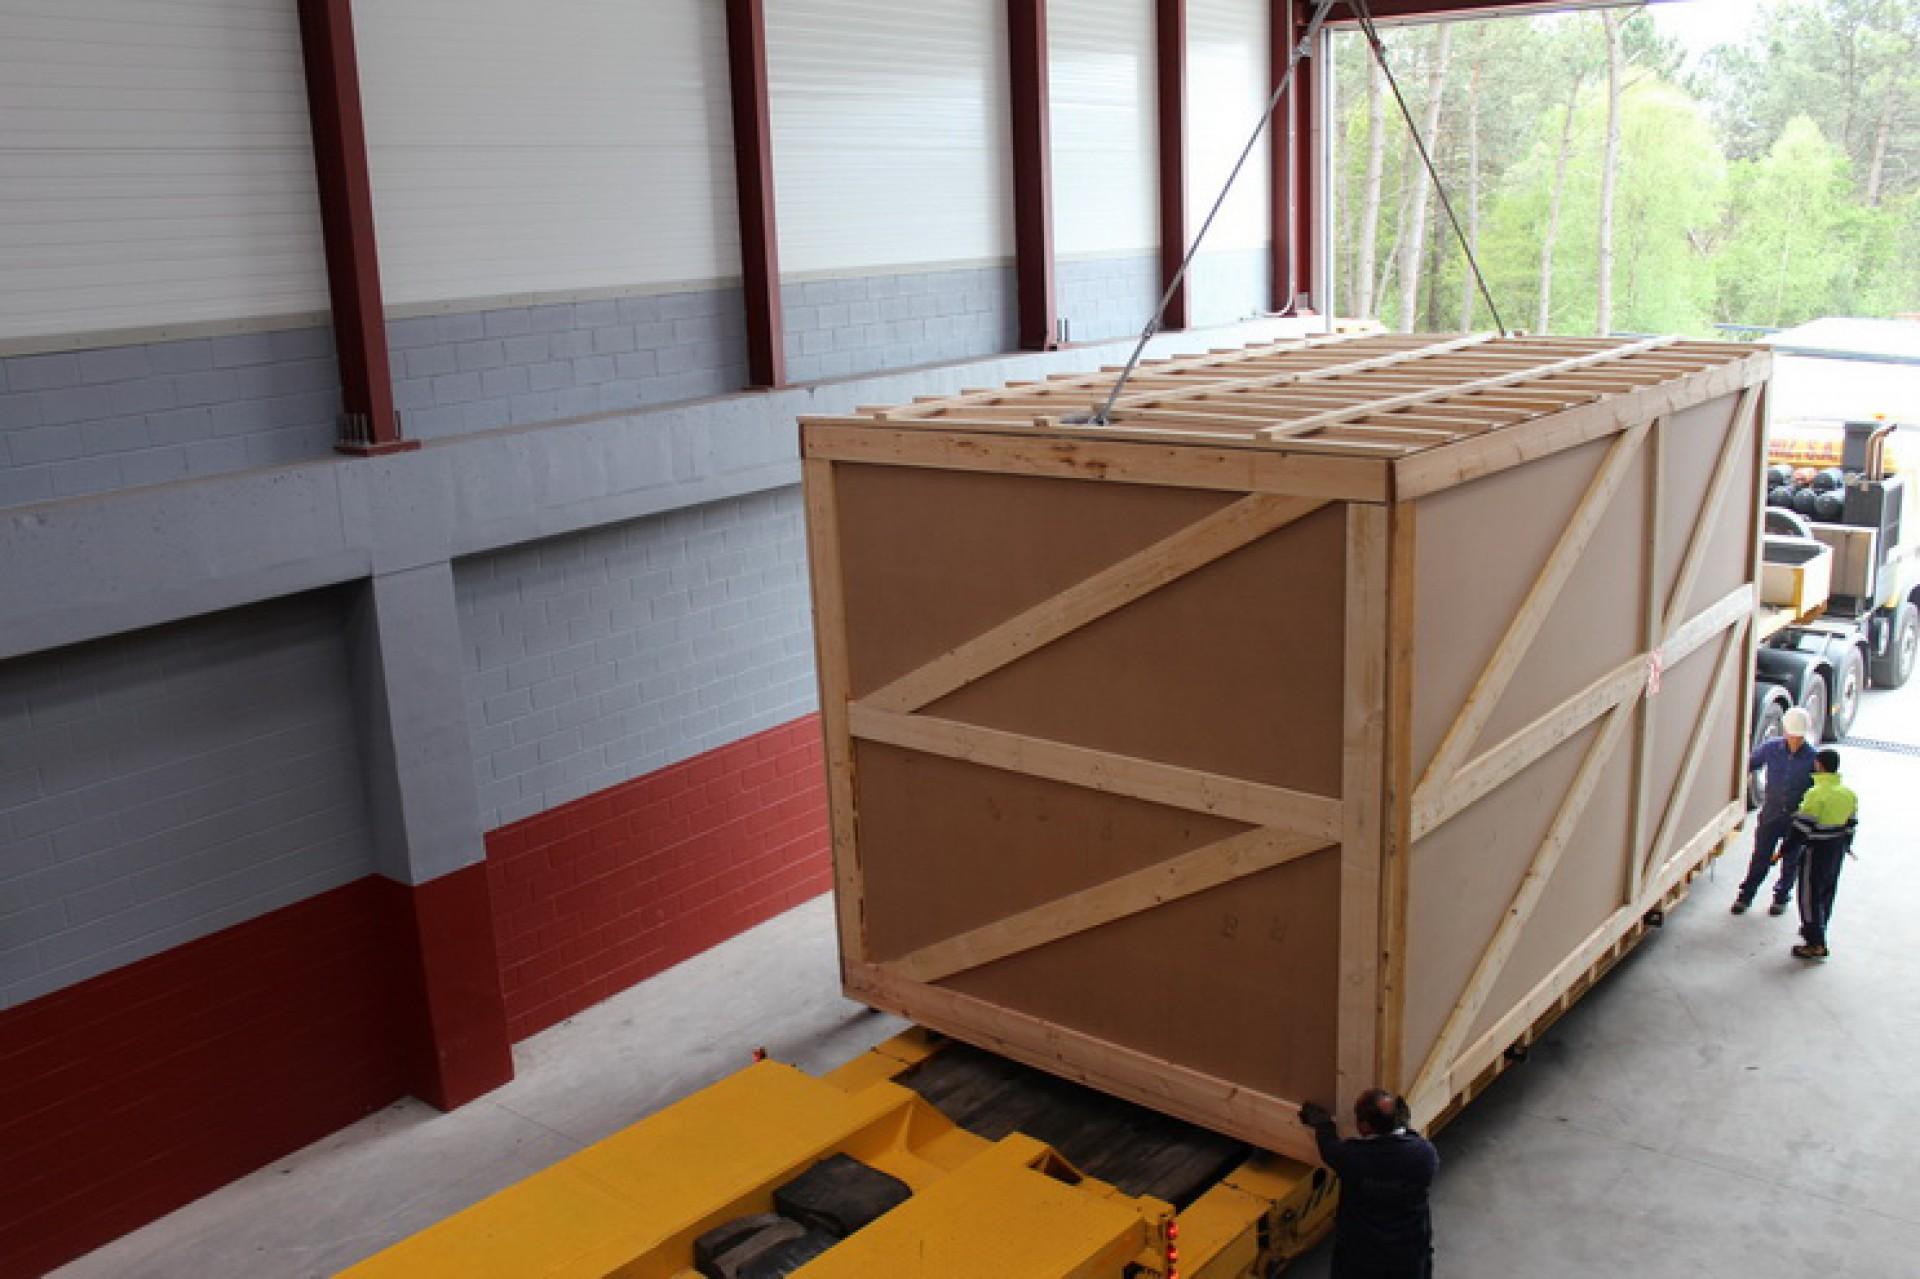 Loading bay – Oversize MWL Expansion Joints – Erbil, Irak